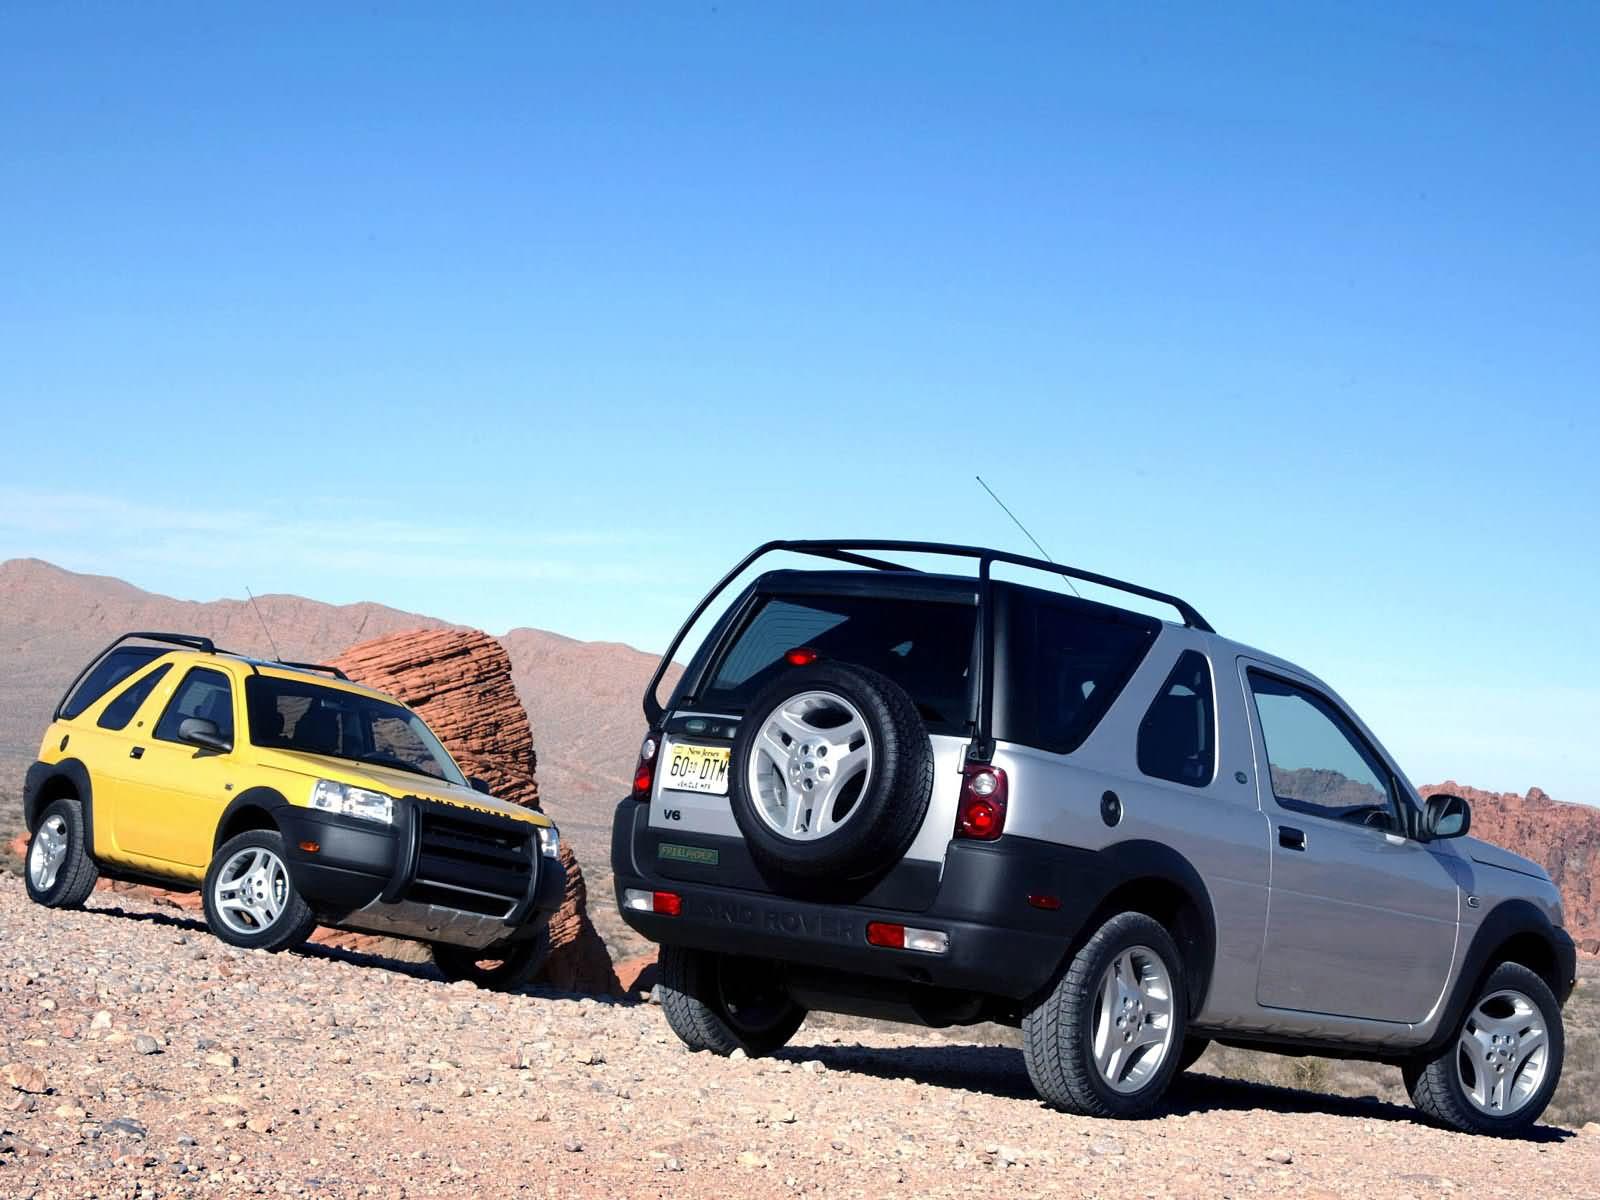 Land Rover Freelander front and back